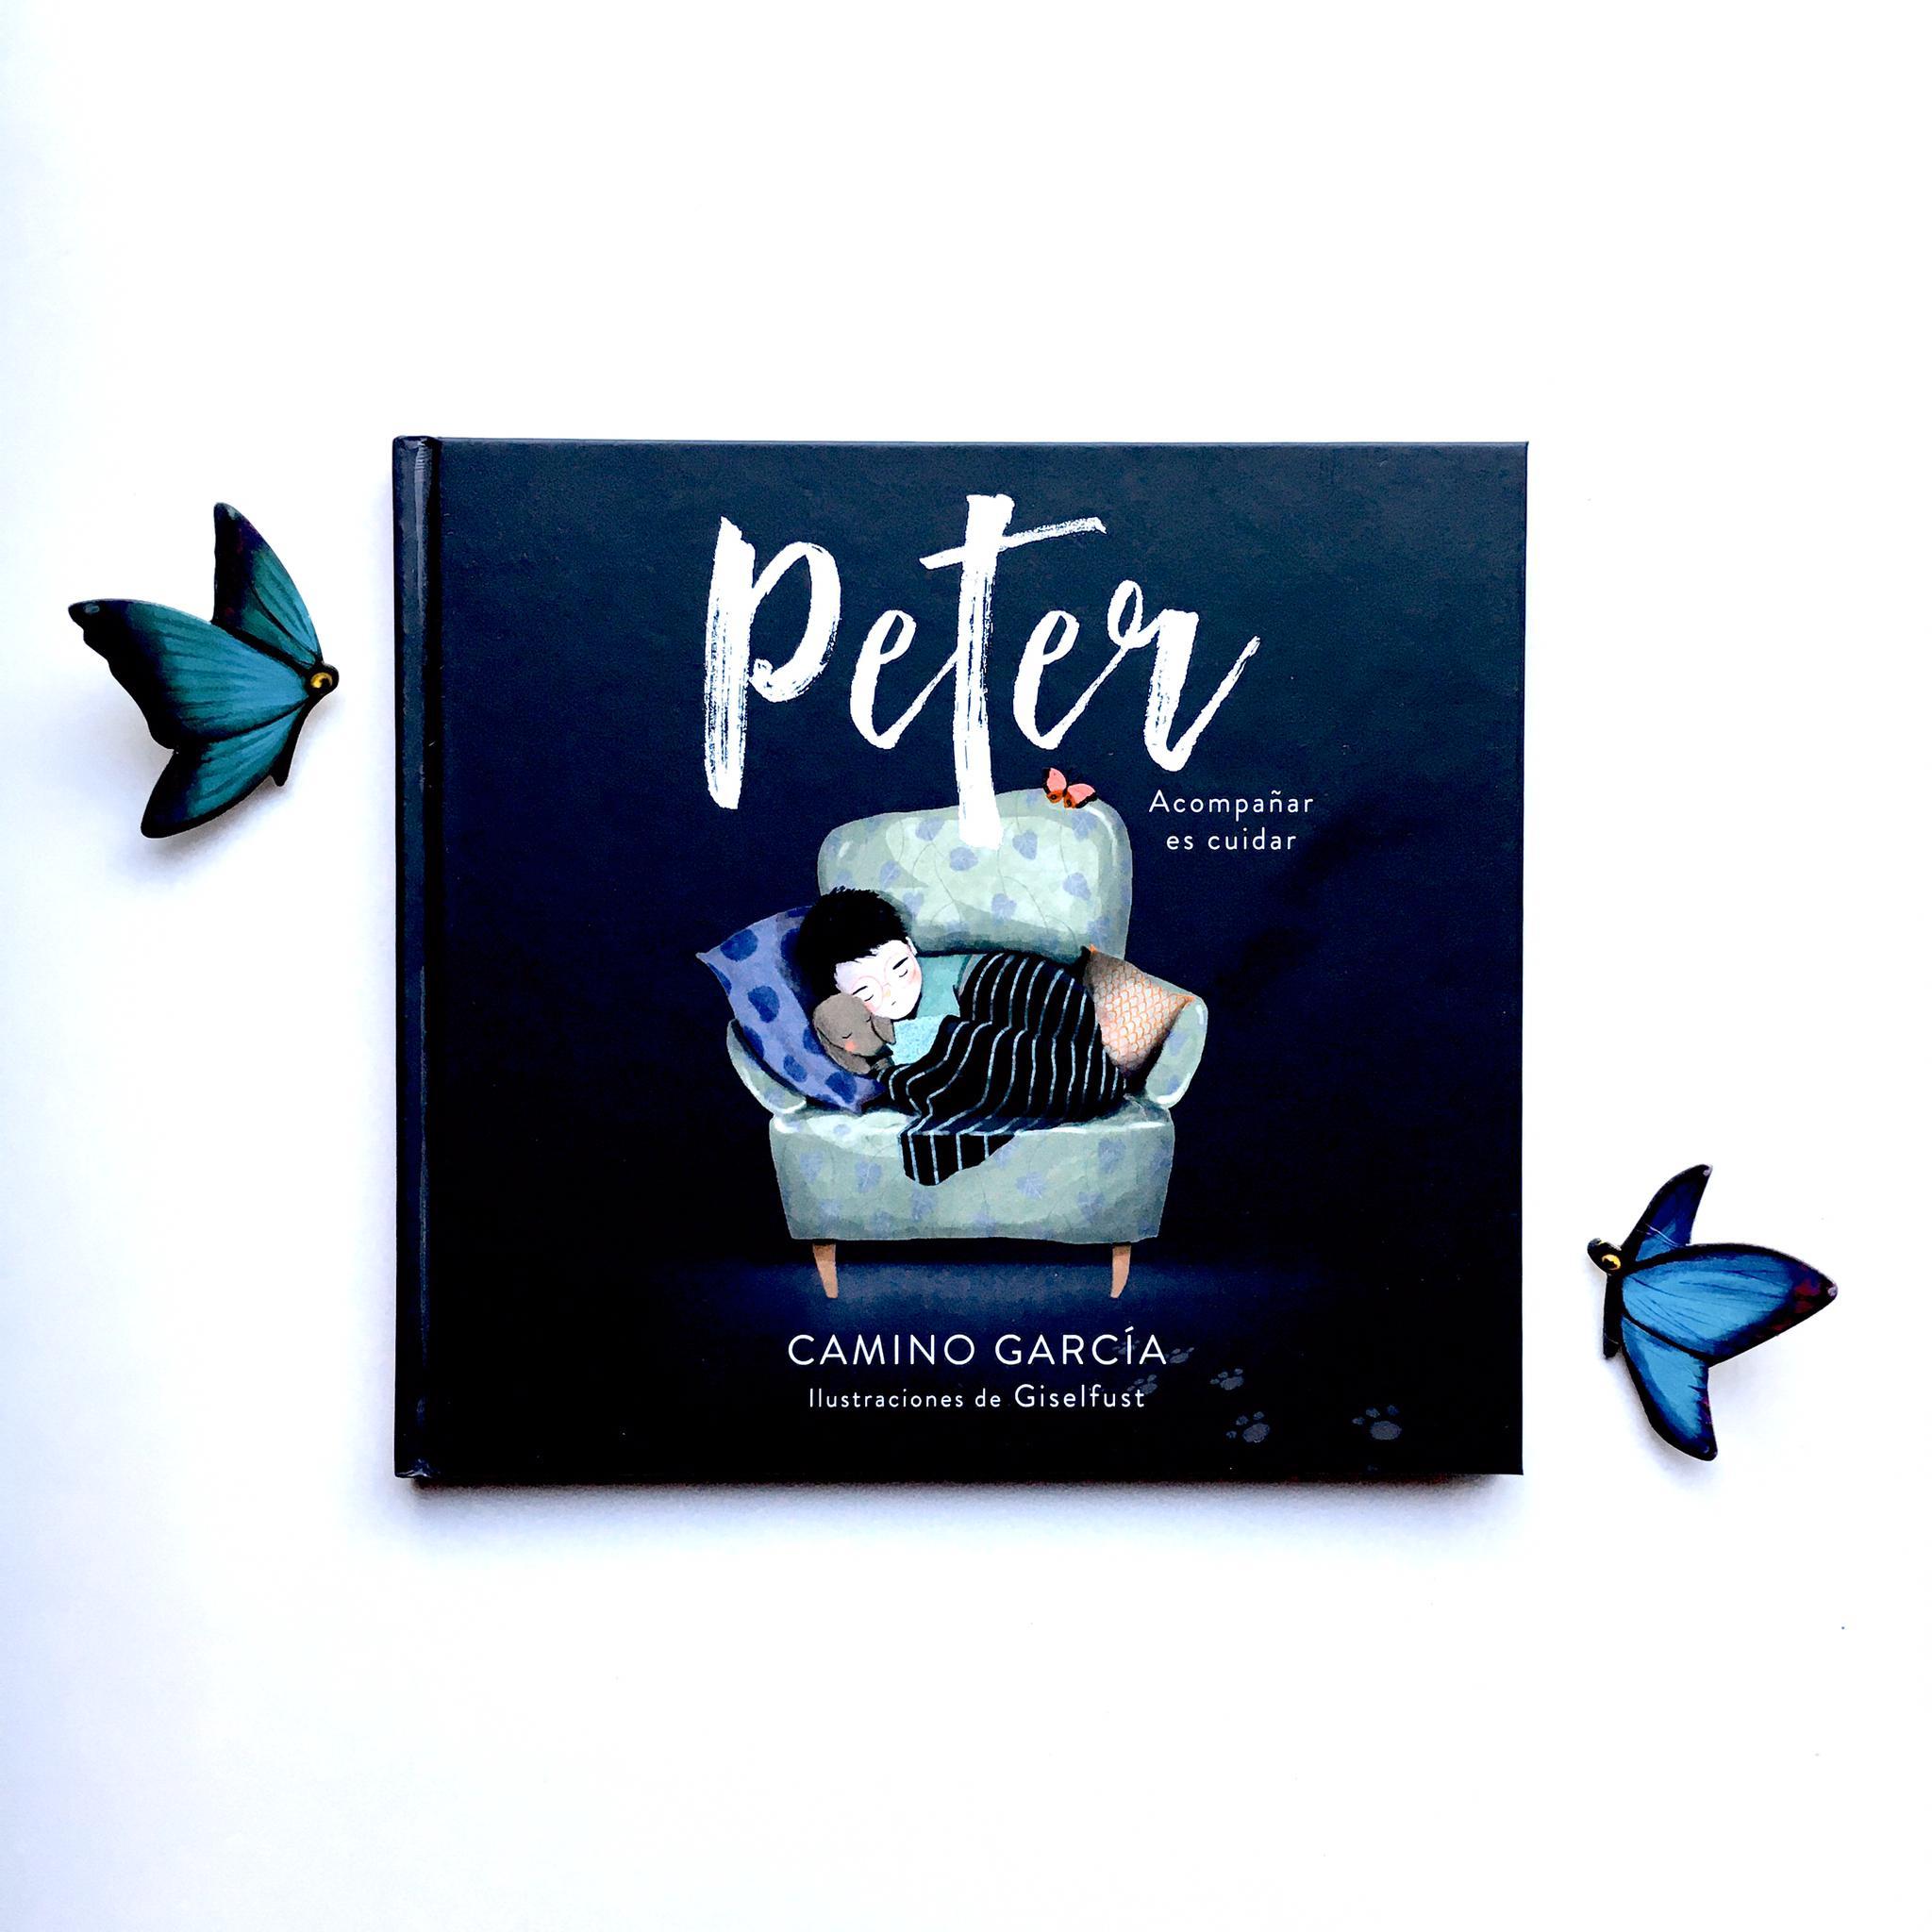 Peter acompañar es cuidar